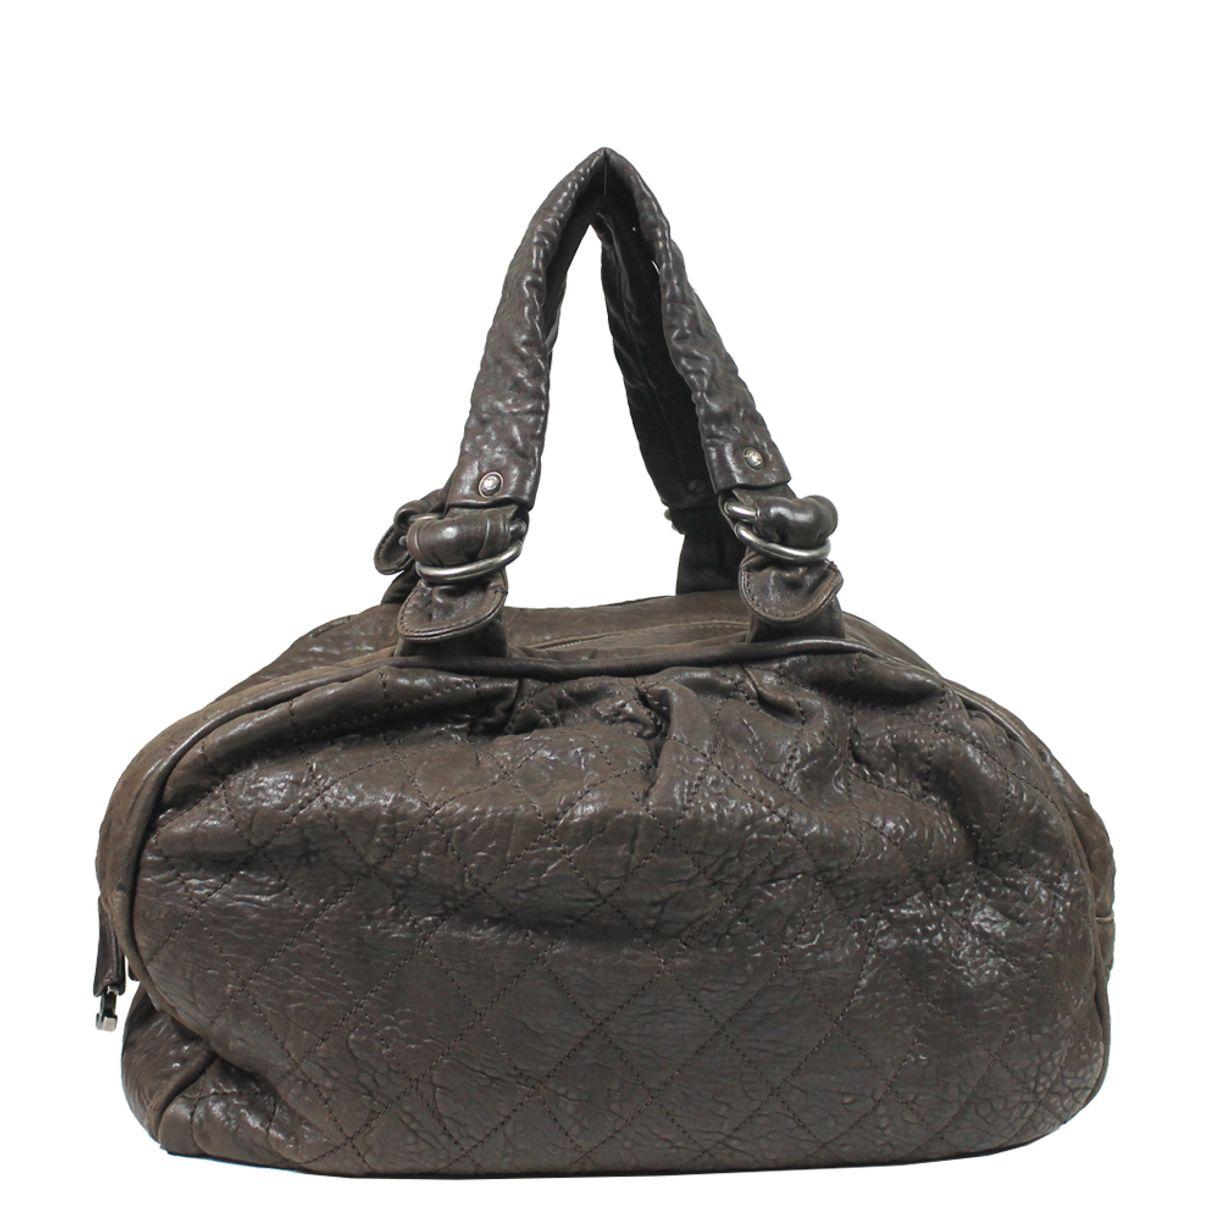 01932-Bolsa-Chanel-Couro-Marrom-3